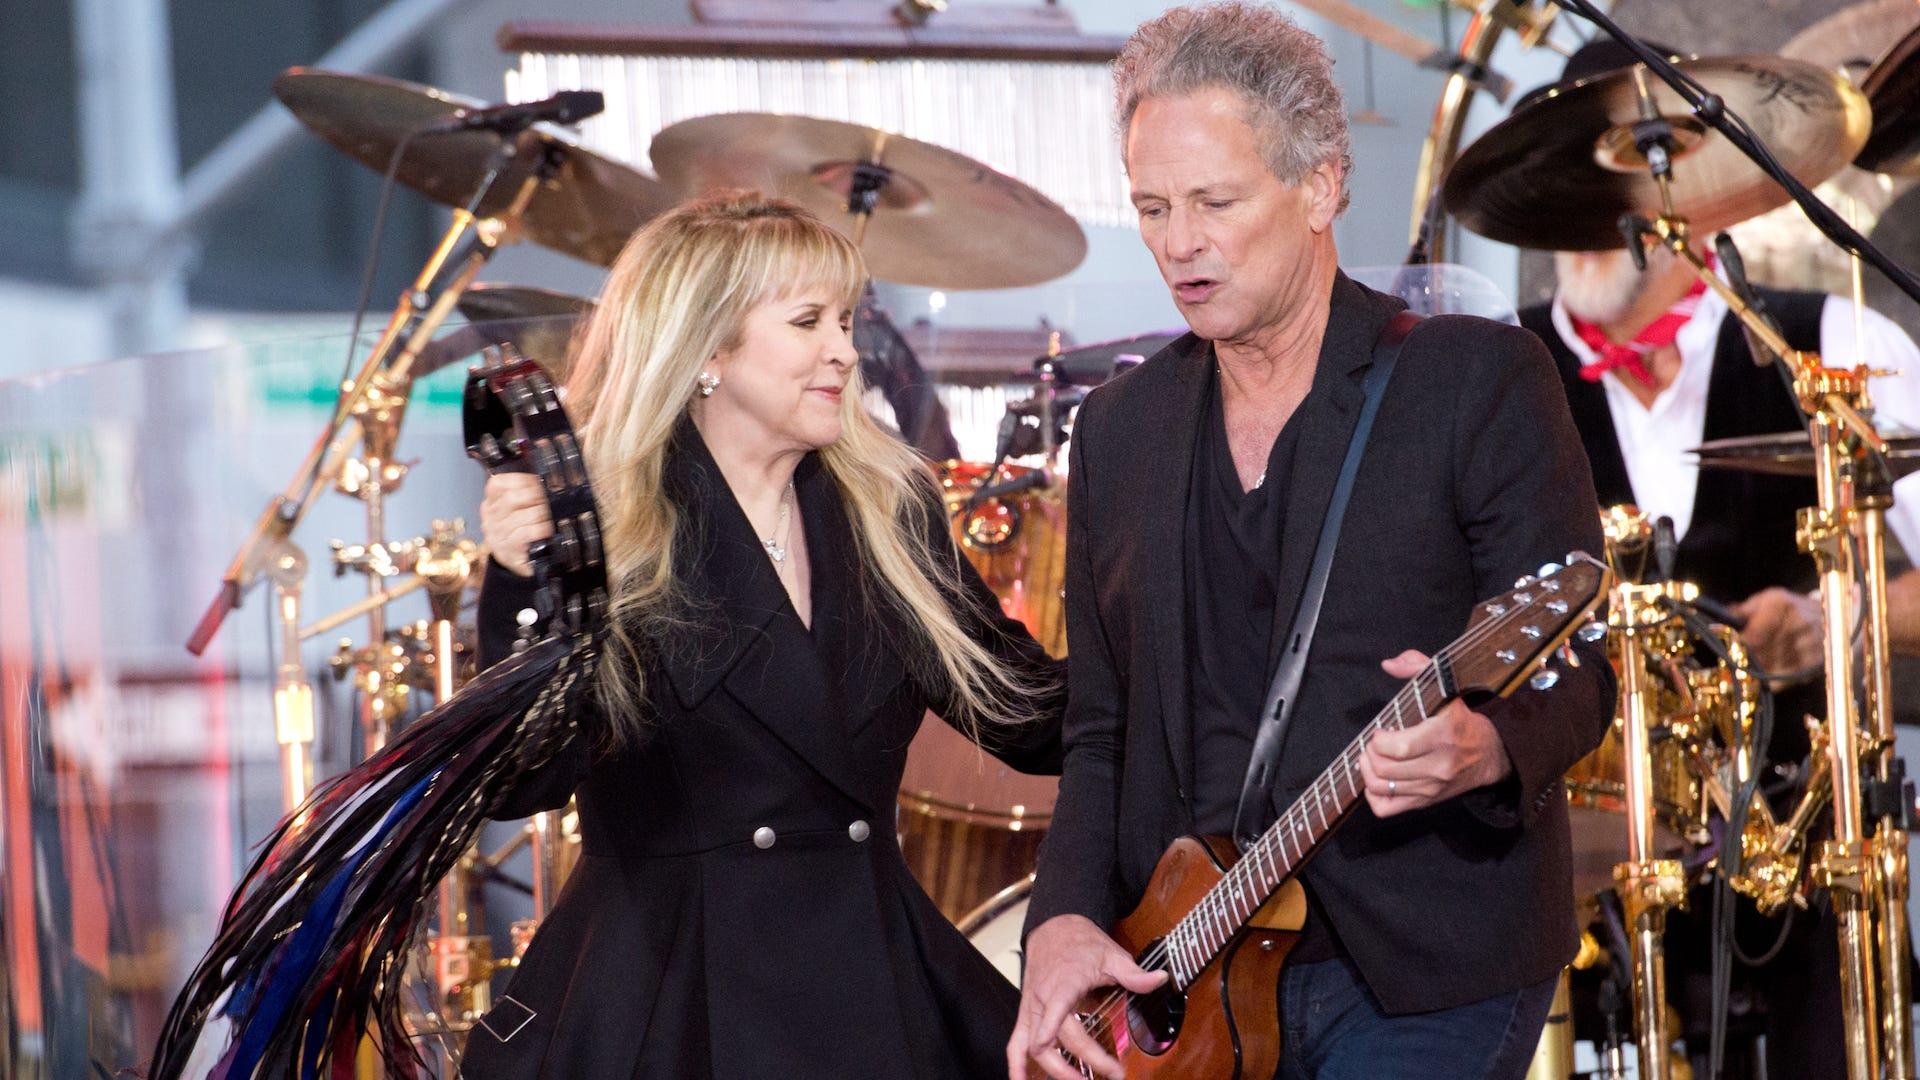 Stevie Nicks fires back at Lindsey Buckingham over Fleetwood Mac exit